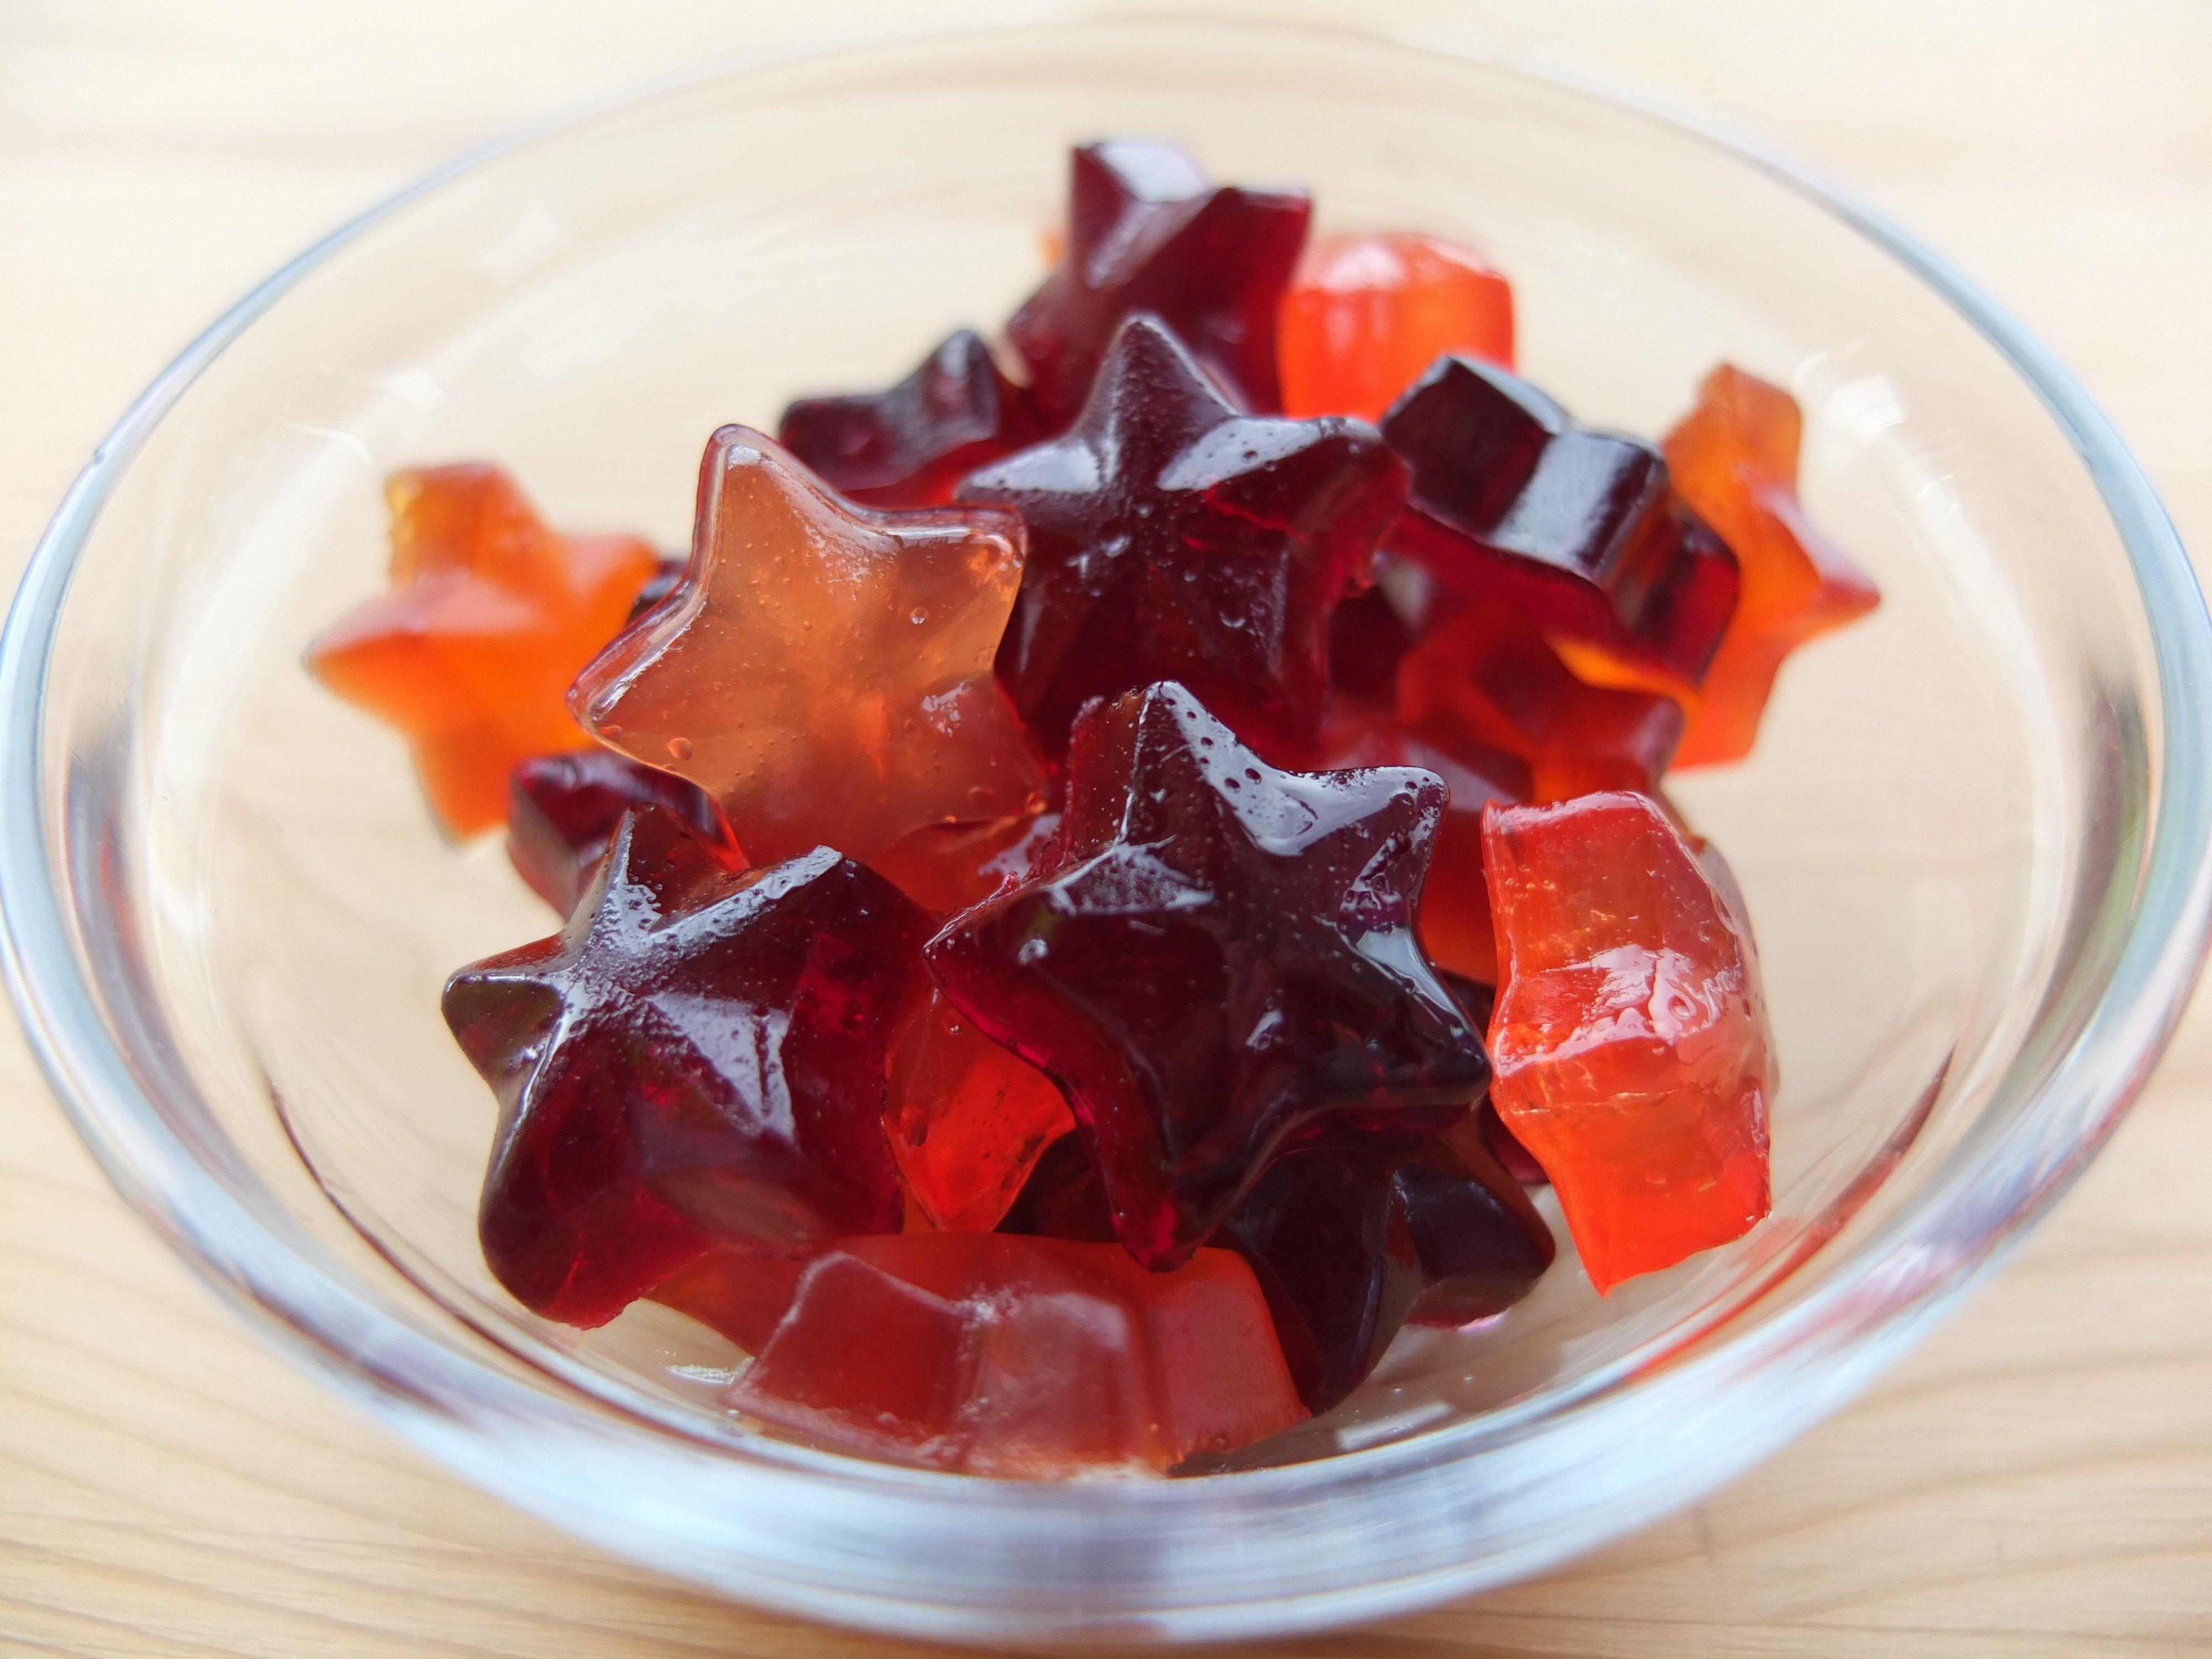 Gummy candies in a bowl.